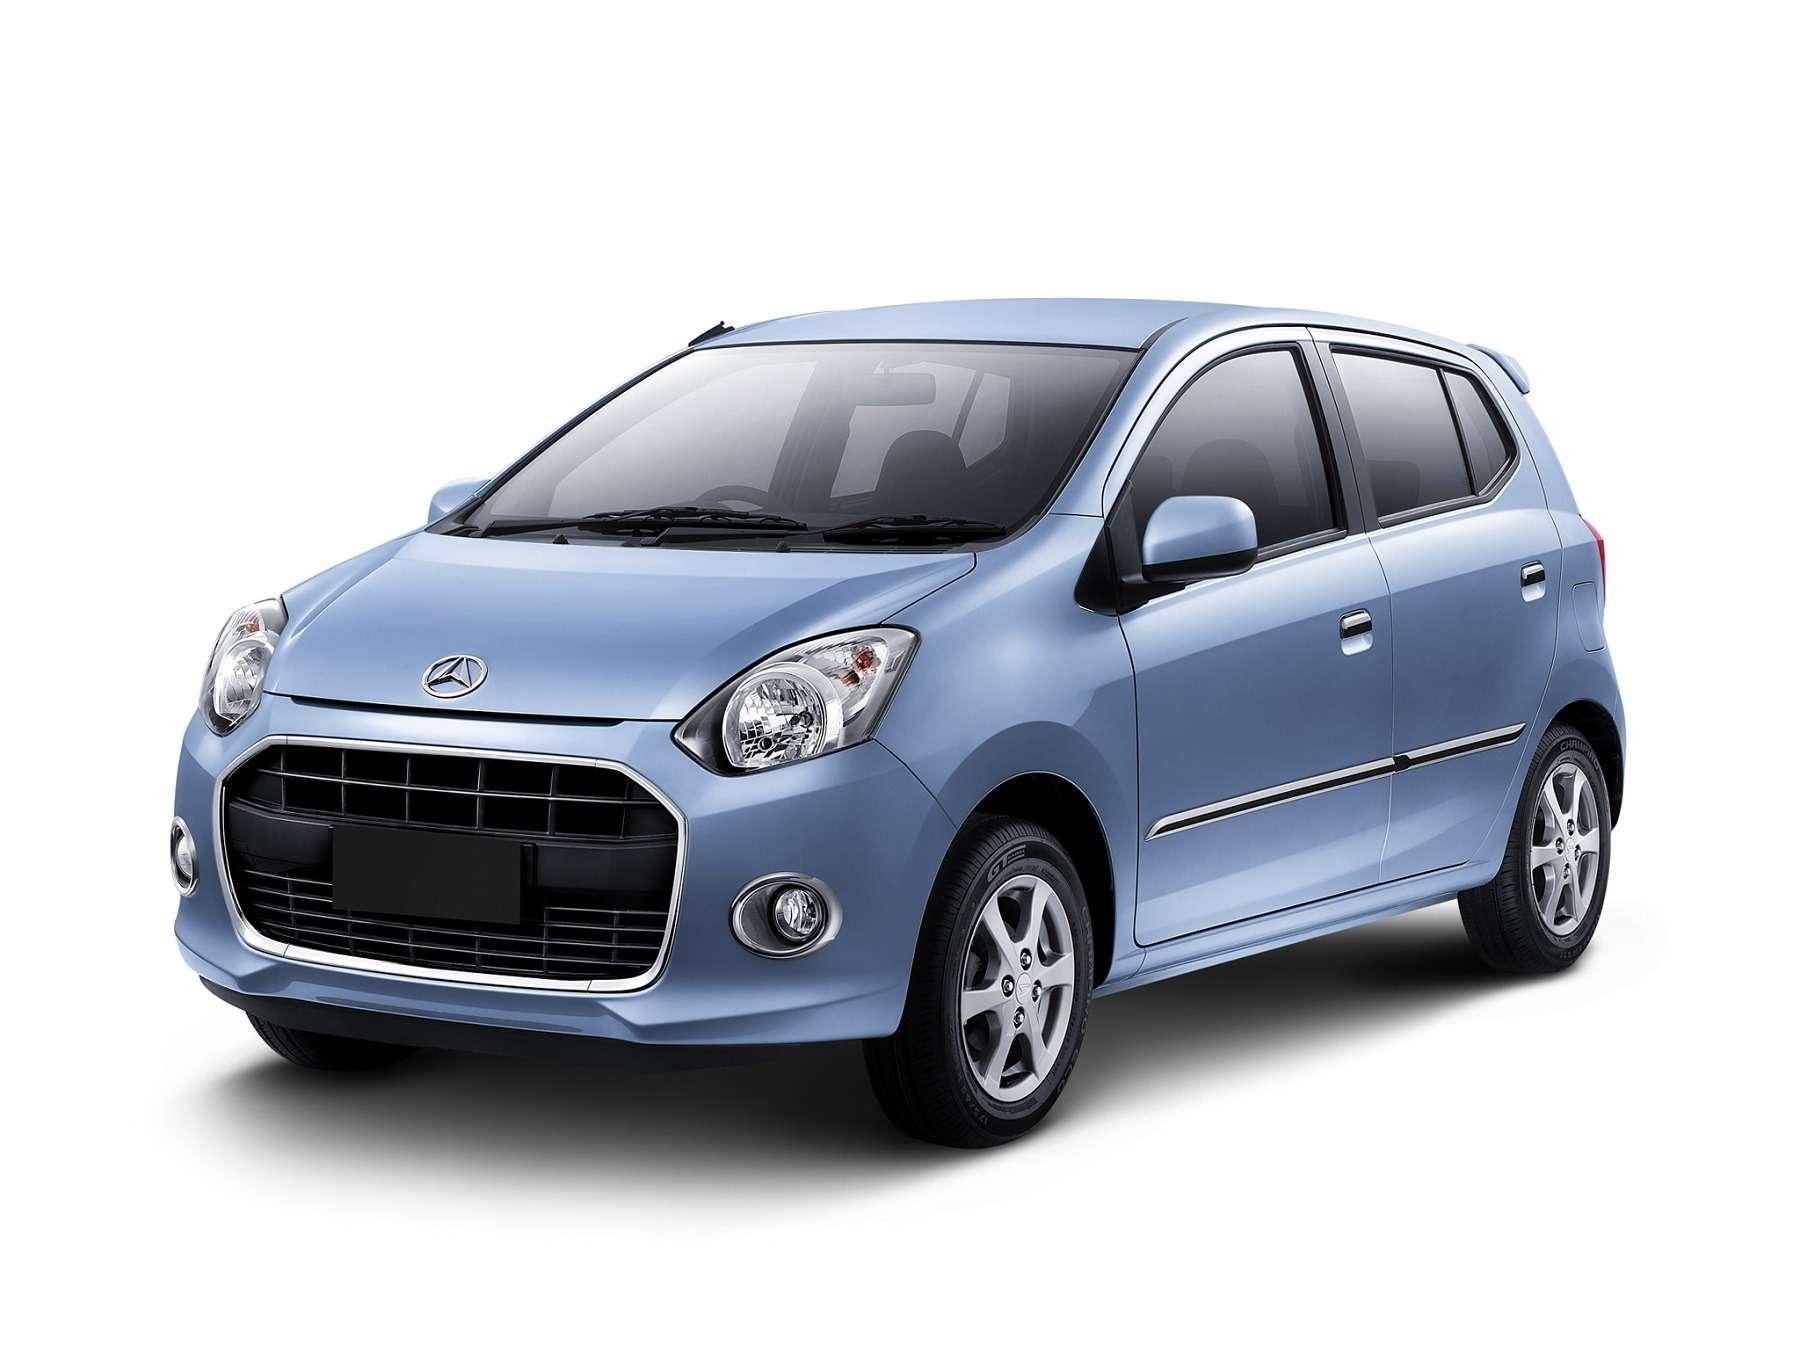 Daihatsu Ayla вИндонезии или Toyota Wigo наФилиппинах